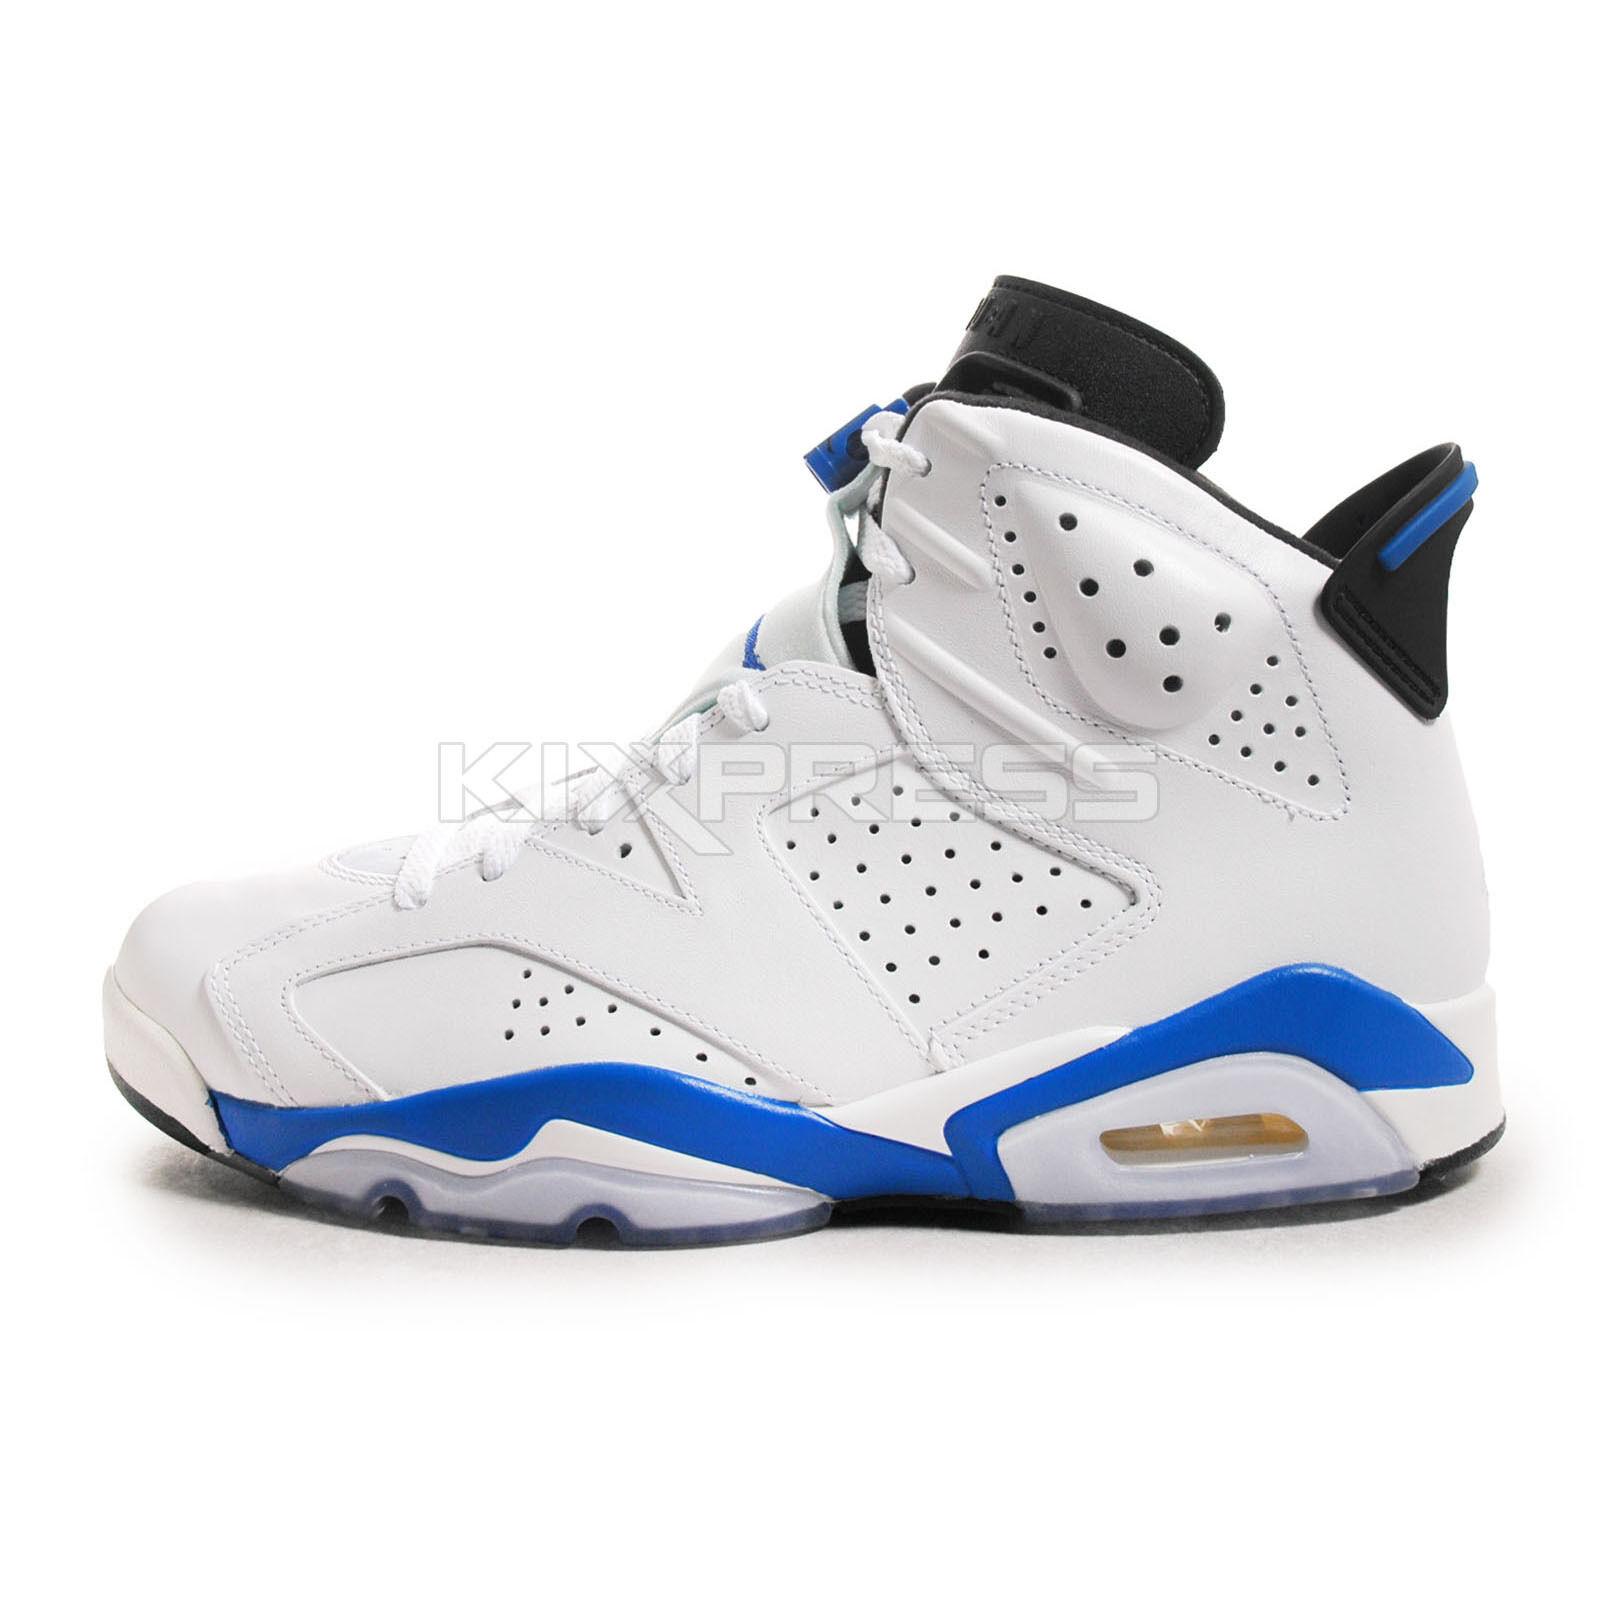 6b34bbcf38 Nike Air Jordan 6 Retro [384664-107] Basketball White/Sport Blue-